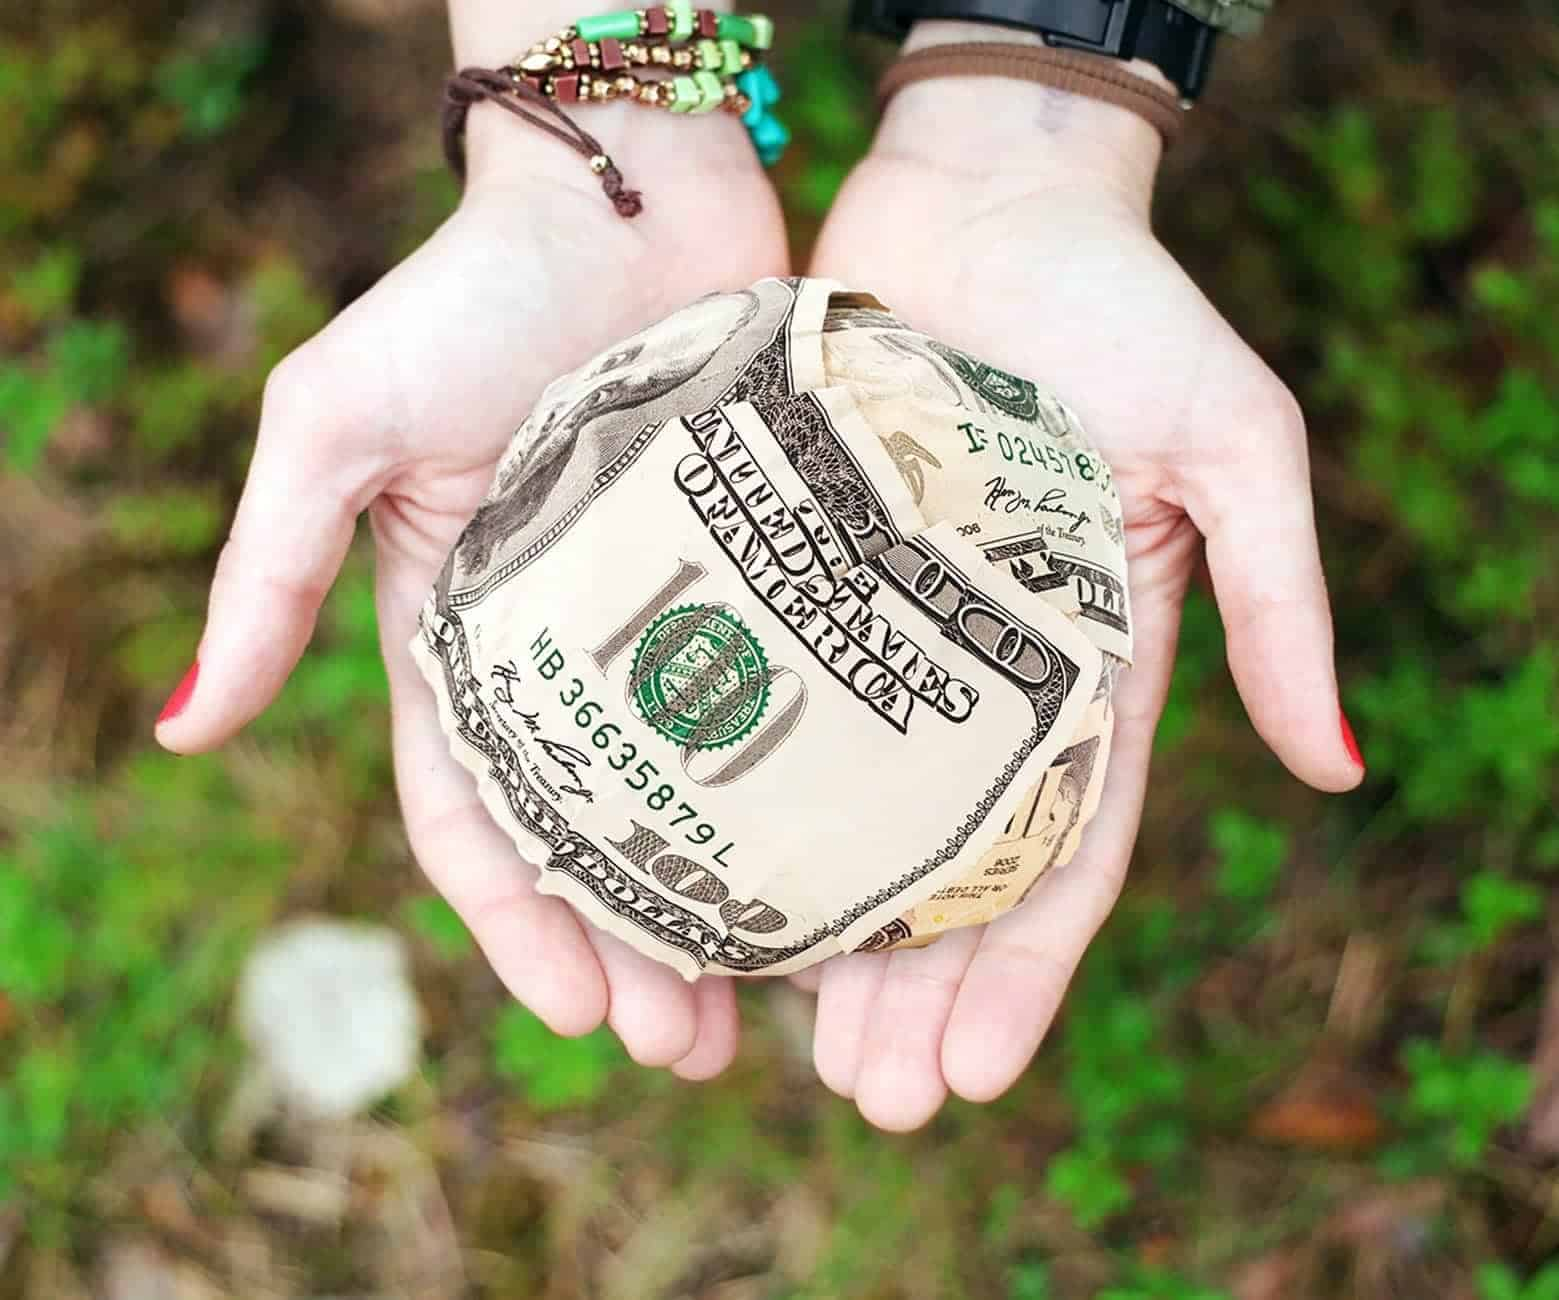 3-6 months of savings in cash